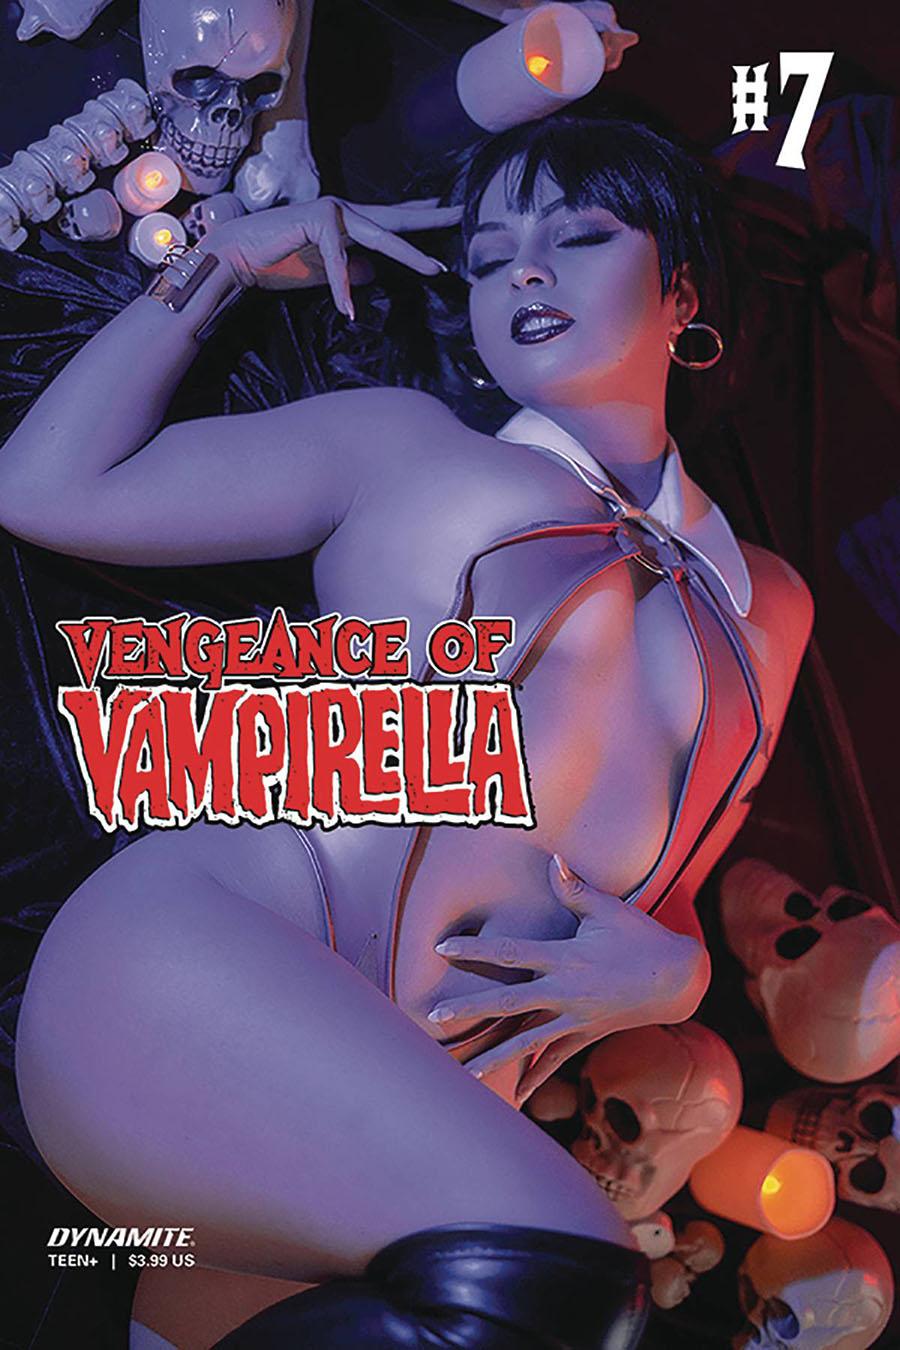 Vengeance Of Vampirella Vol 2 #7 Cover D Variant Allyson Ochs Cosplay Photo Cover